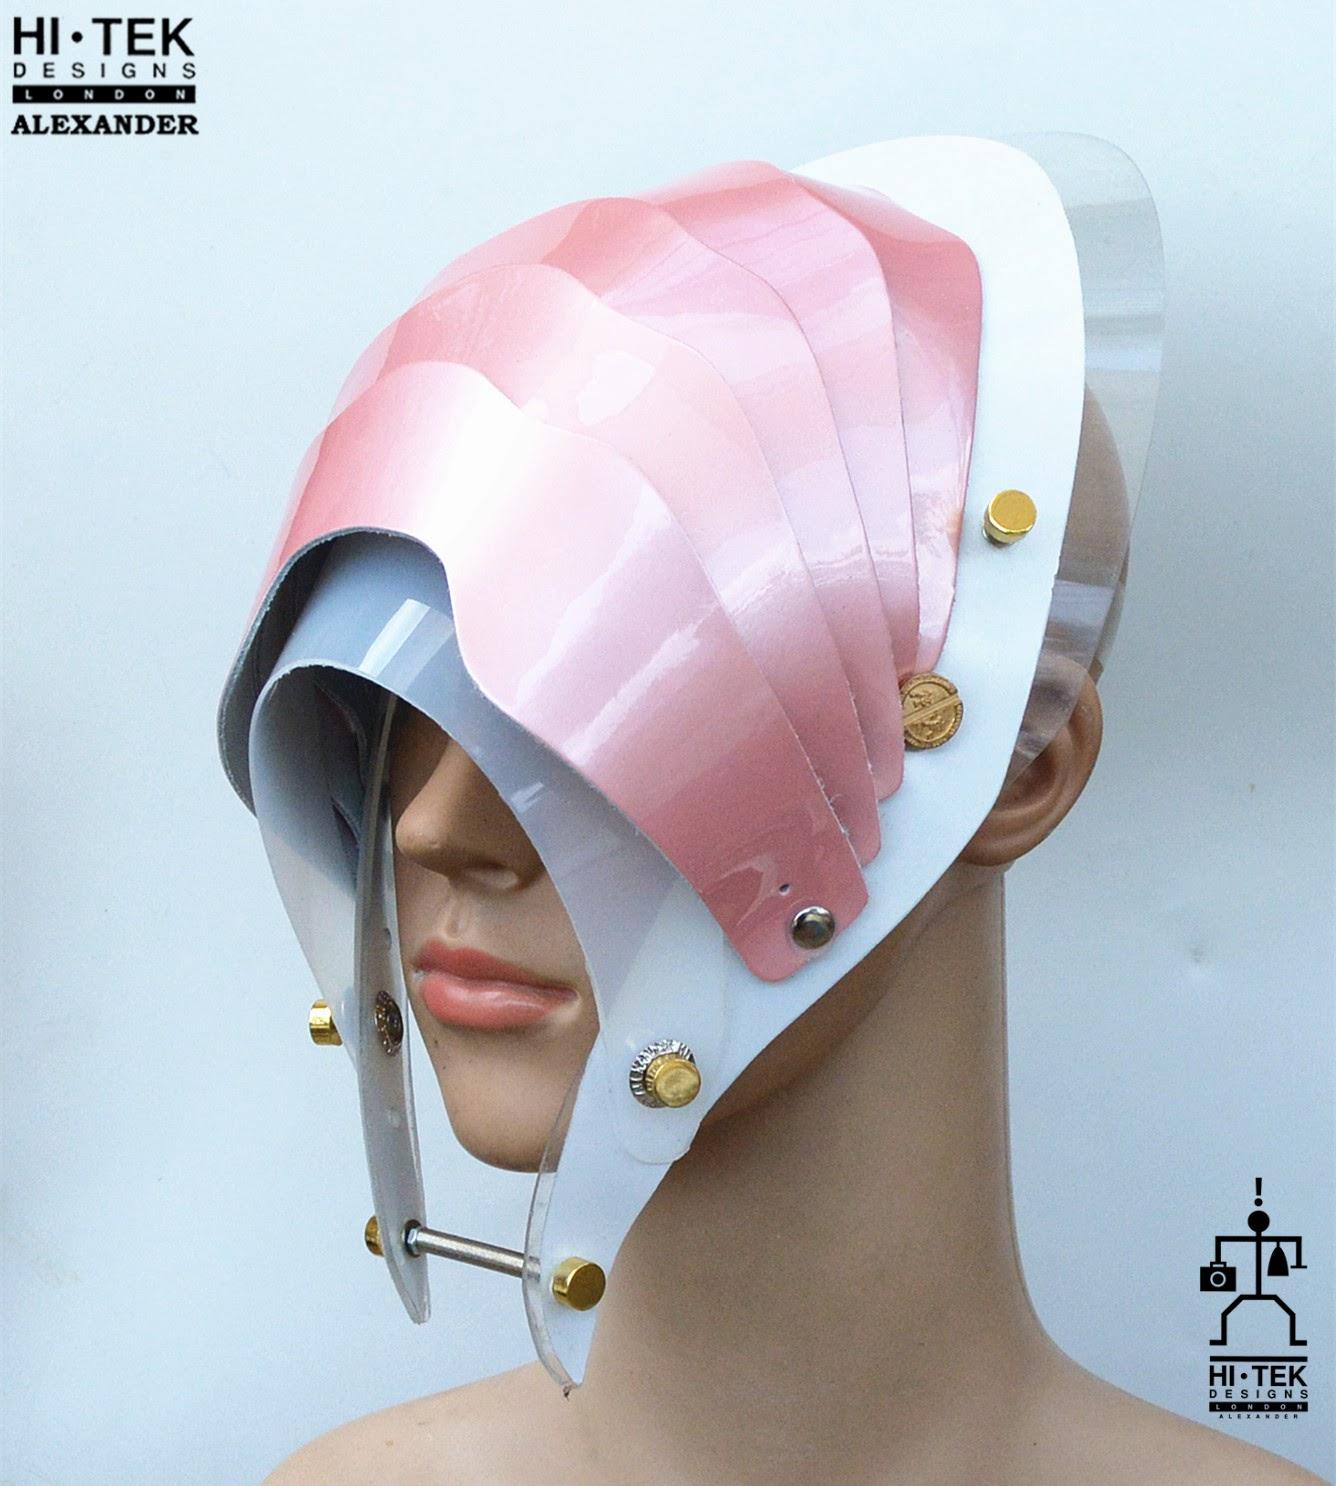 Hi Tek Alexander handmade modern futuristic, sci fi ,gothic ,steampunk unusual party eyewear alien cosplay mask hat headpiece helmet pink wide